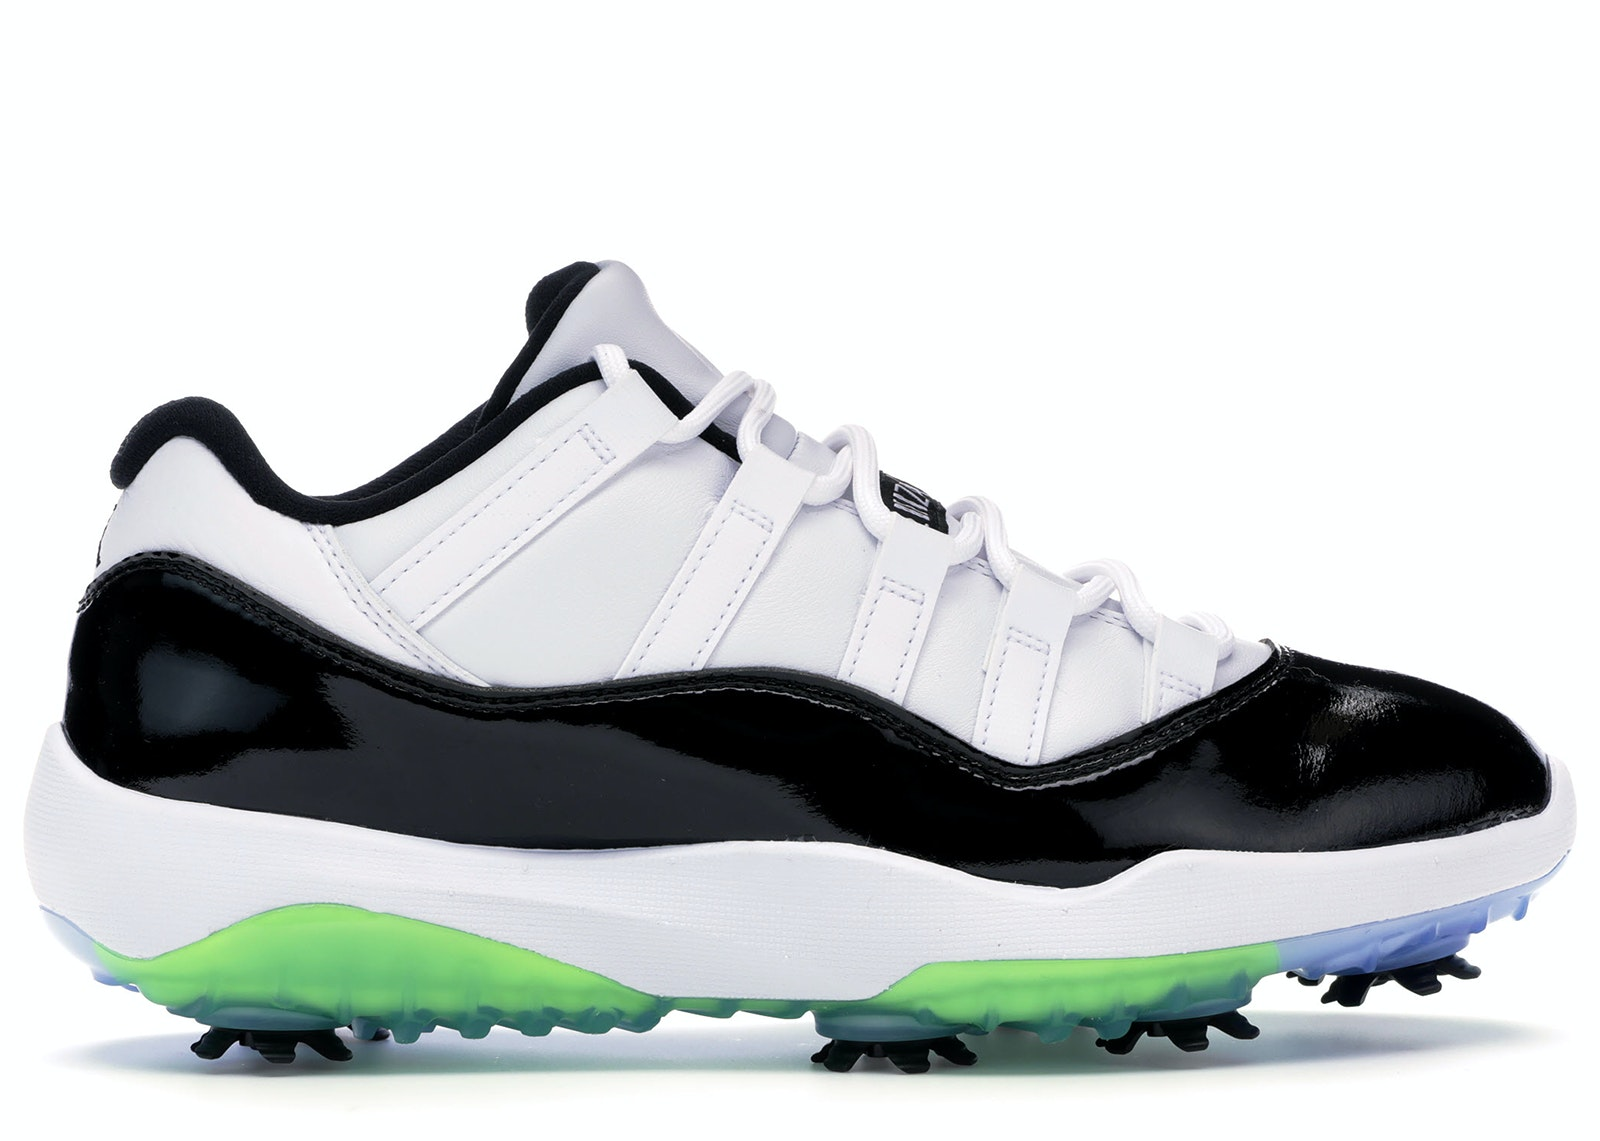 Jordan 11 Retro Low Golf Concord